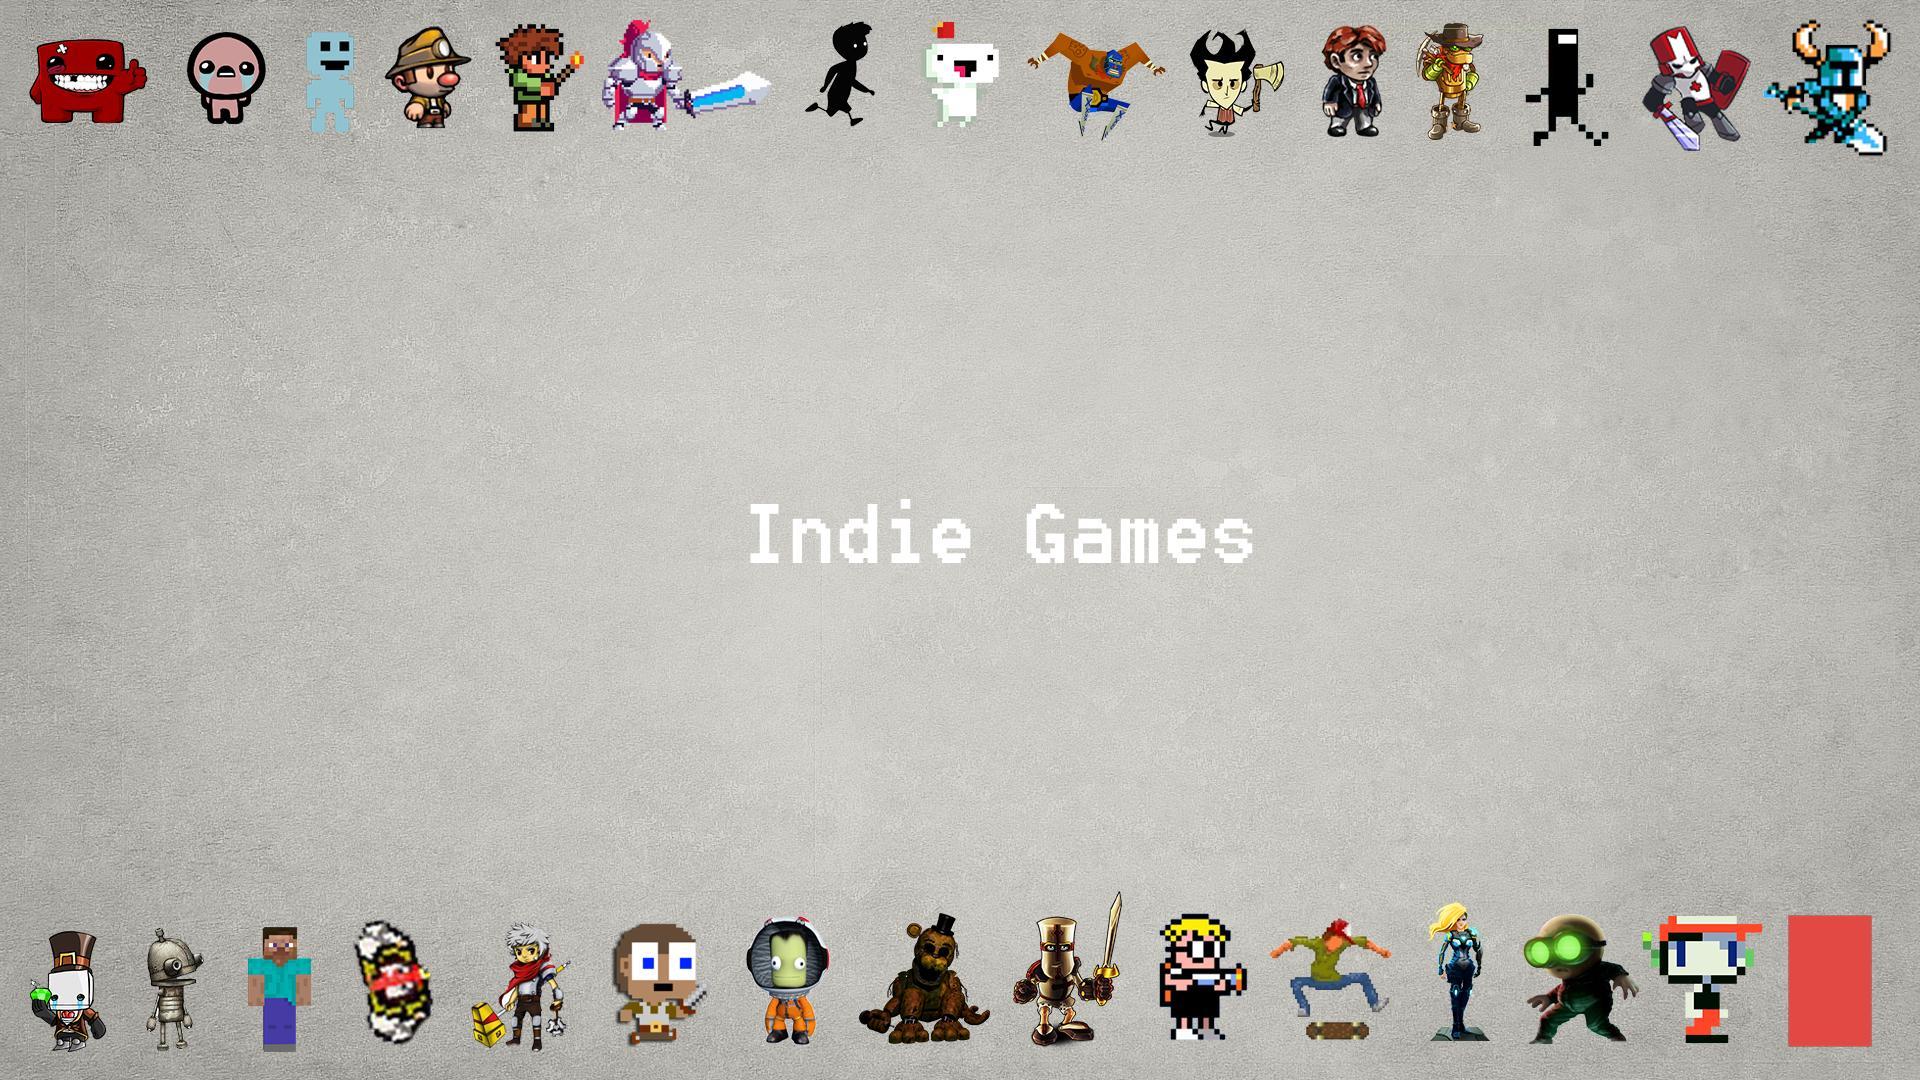 Gaming Pc Wallpaper For Girls Hd Indie Desktop Wallpapers Pixelstalk Net